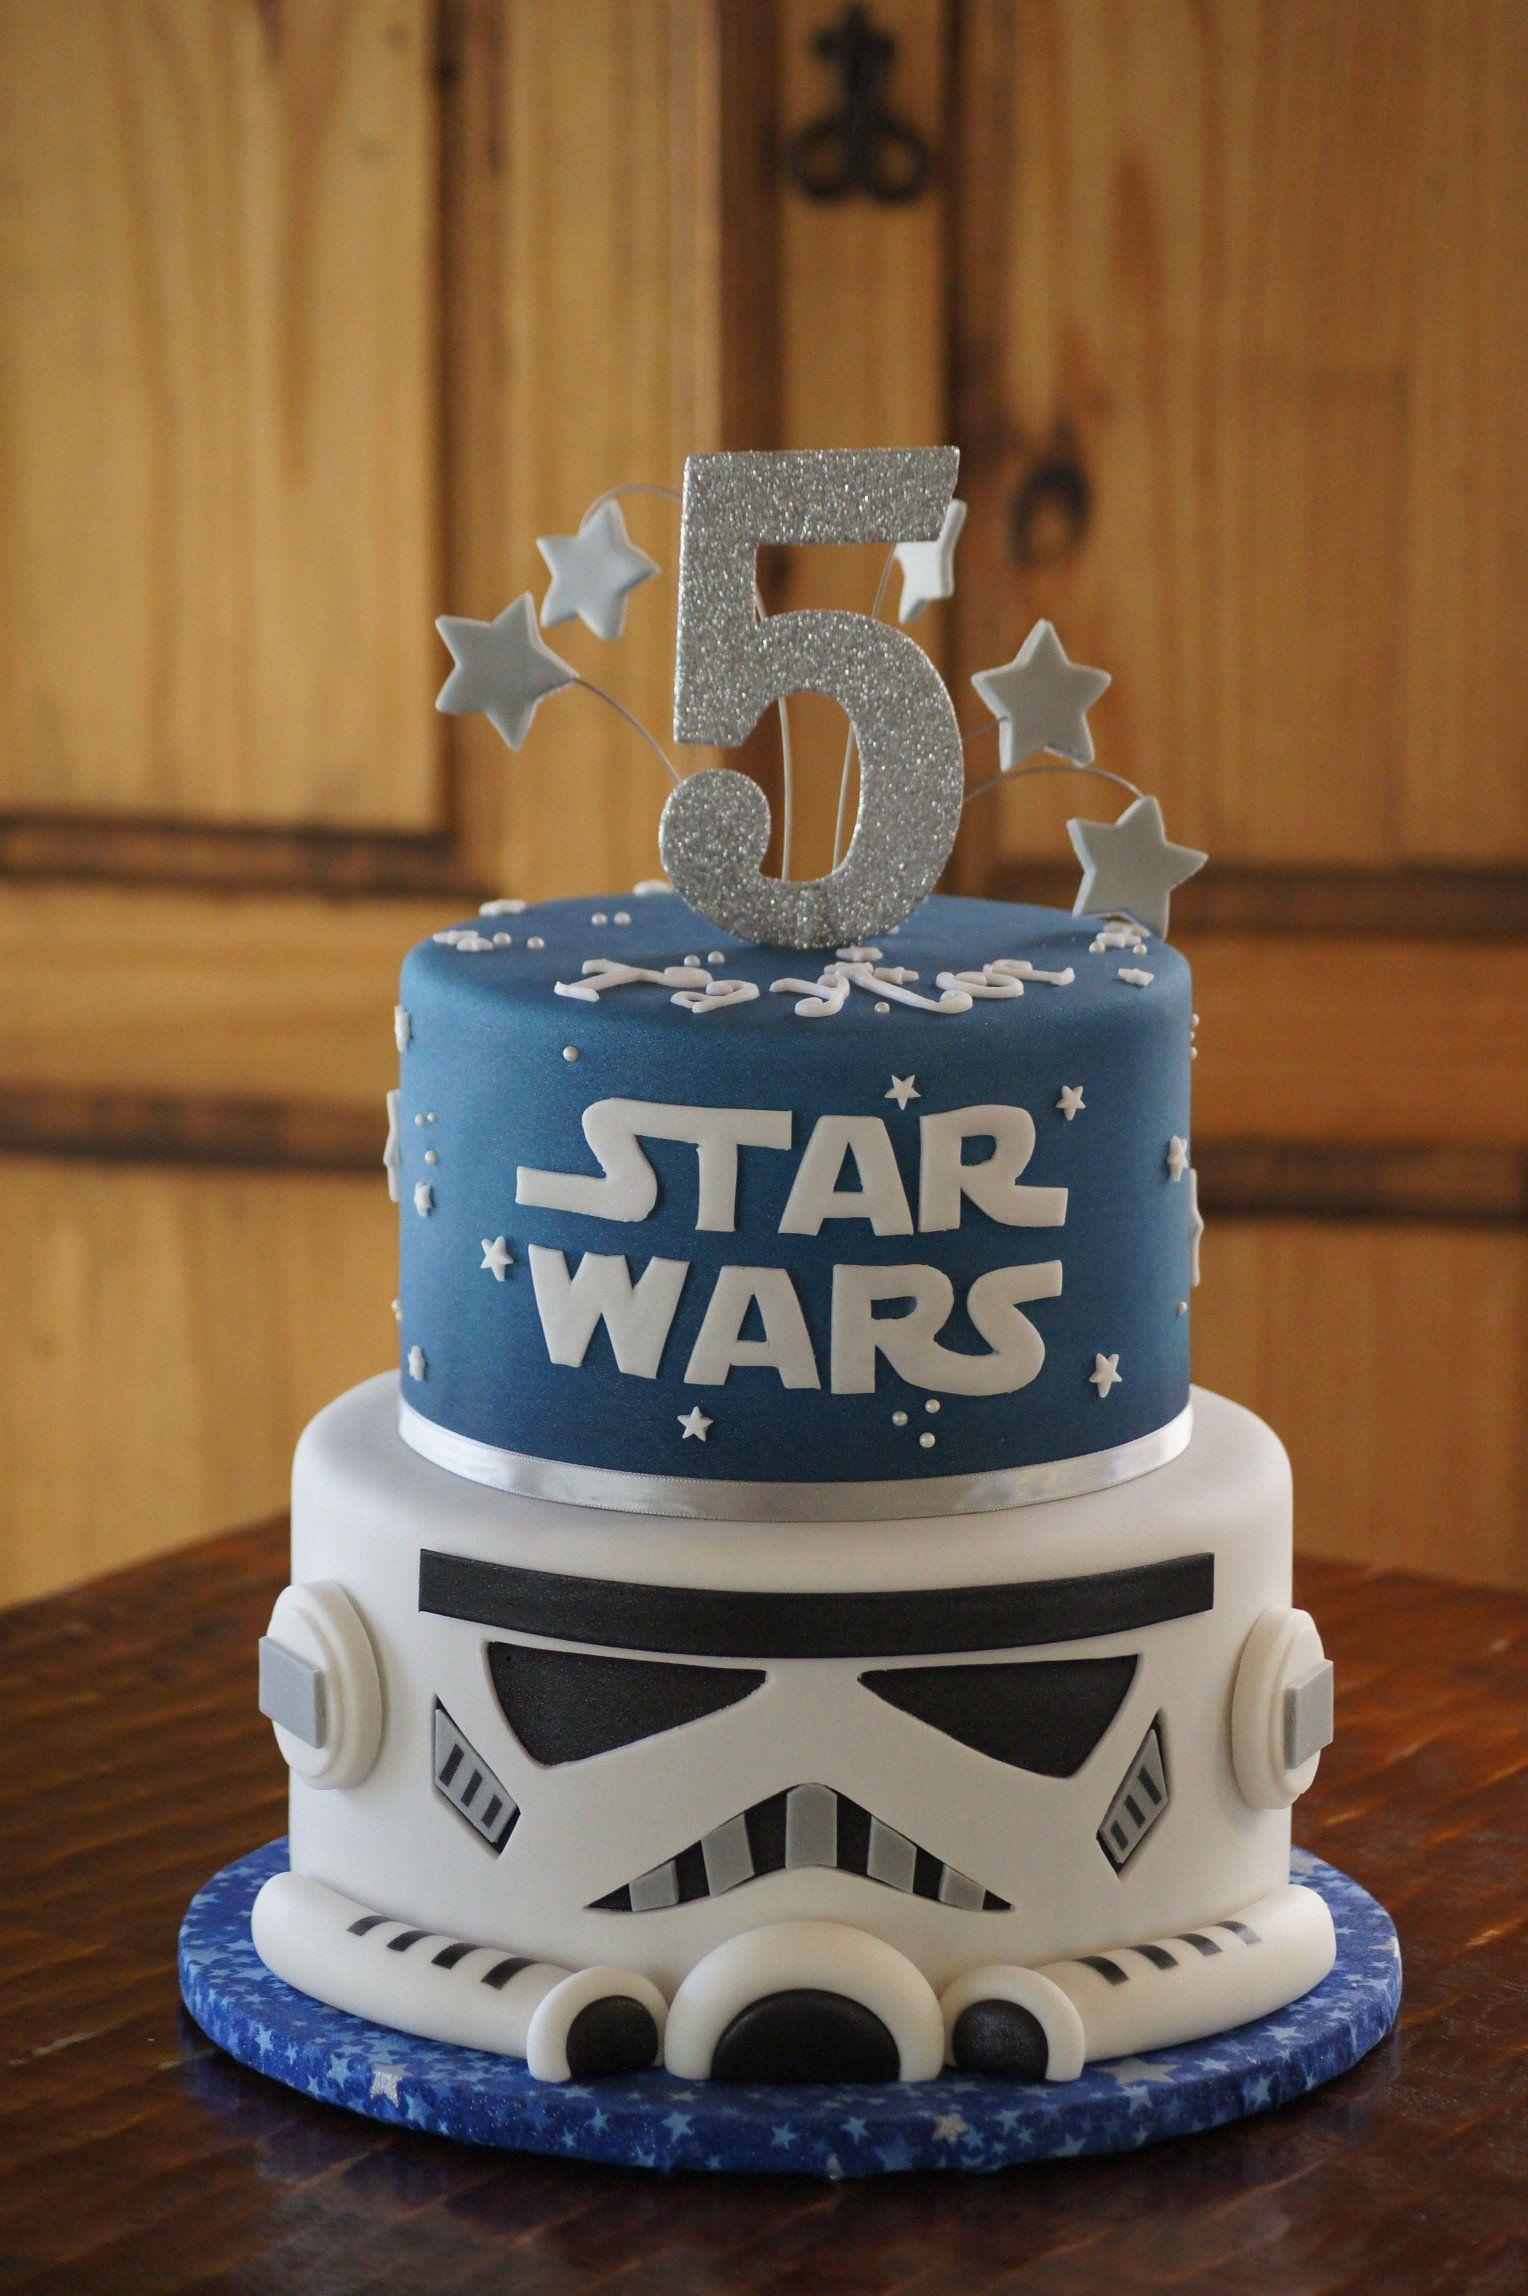 Star Wars Cake Decoration Ideas Fresh 28 Beautiful Star Wars